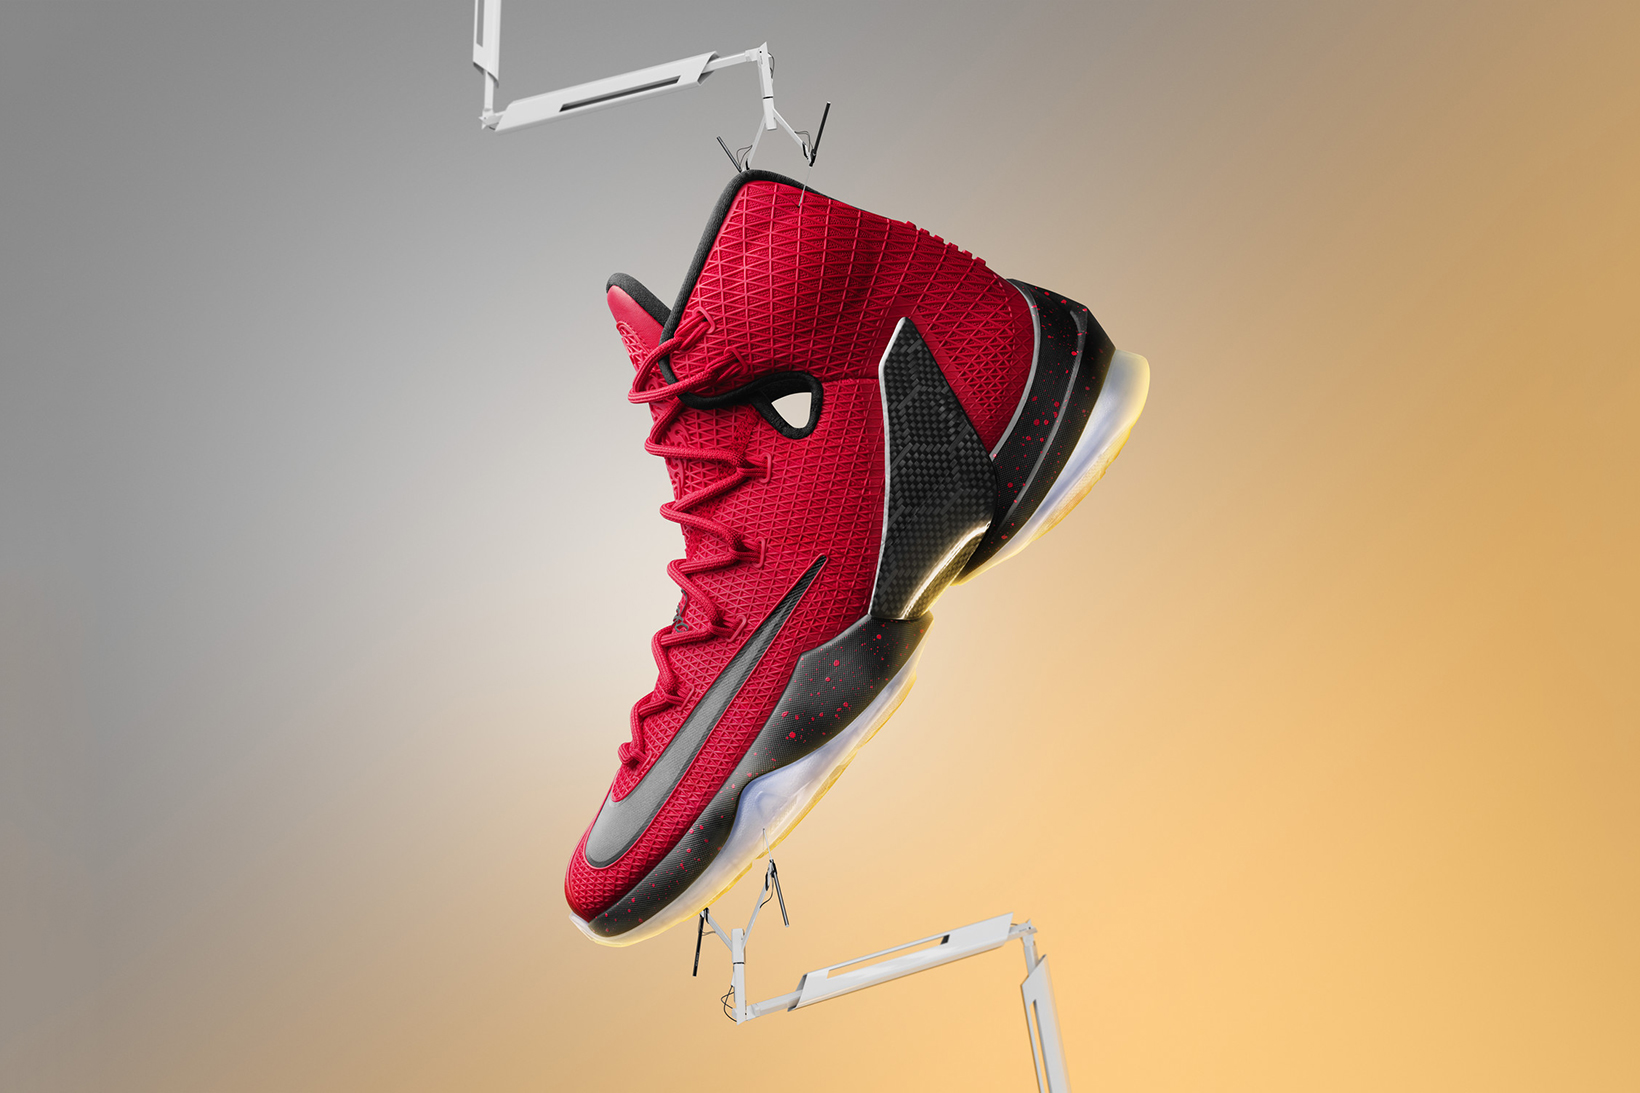 Nike Basketball Unveils LeBron 13 Elite for James's Championship Mission